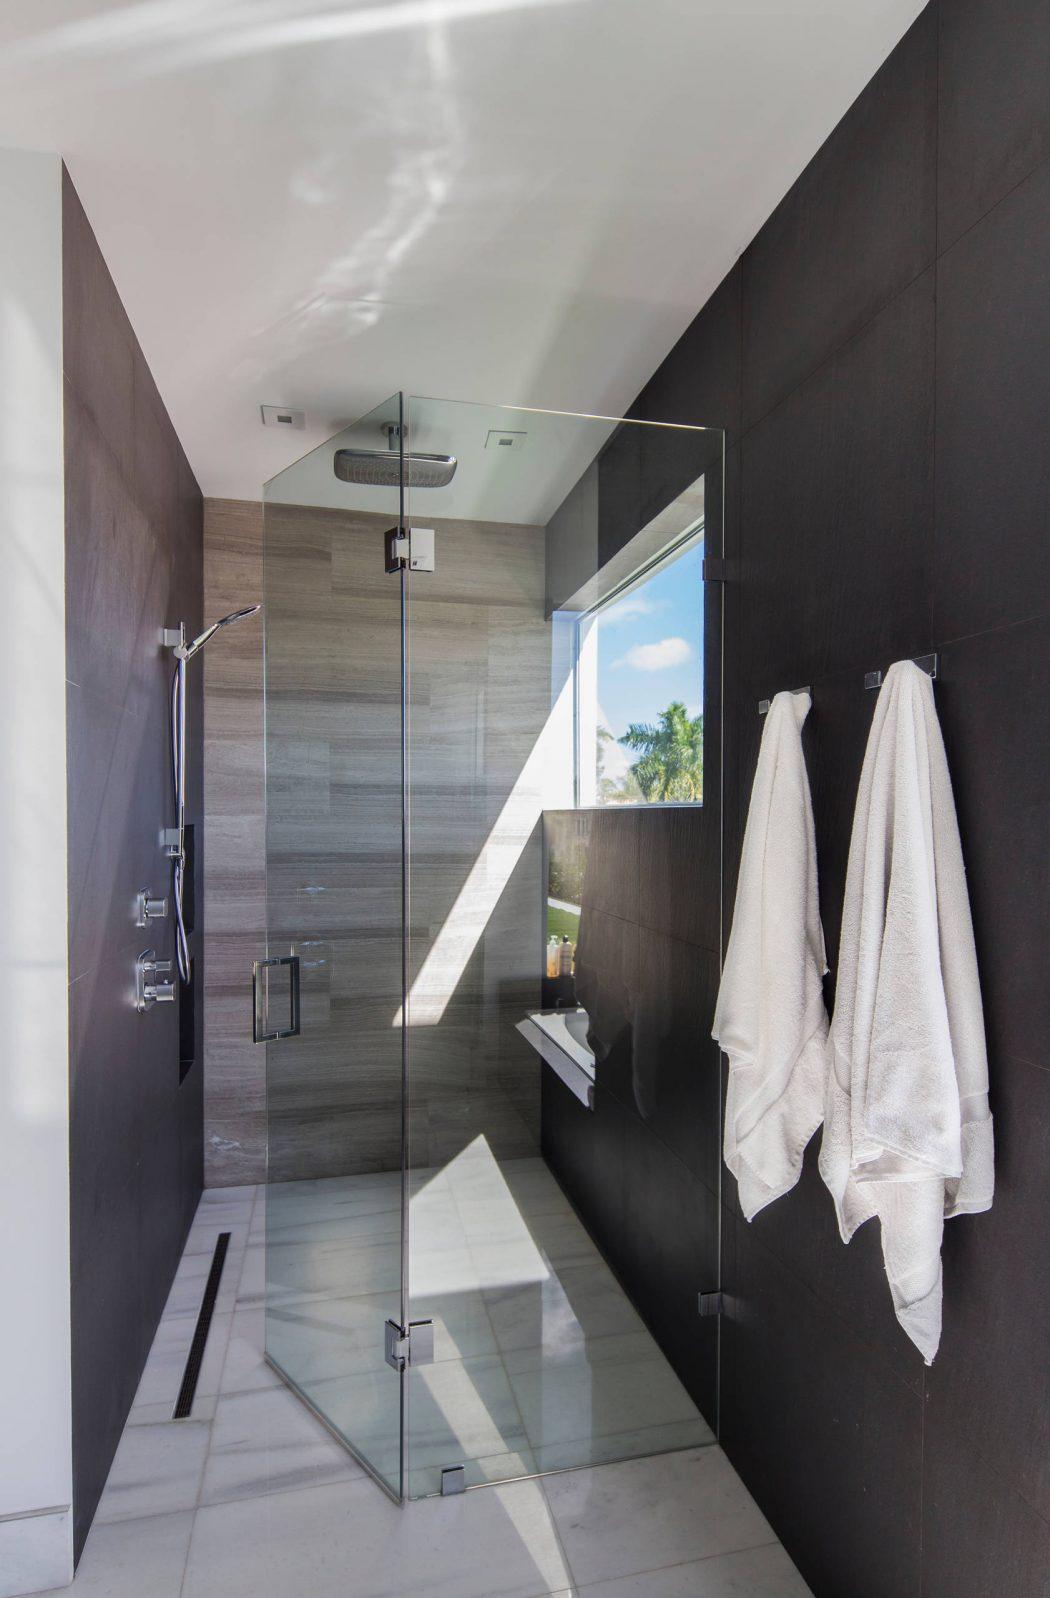 Miami Splendor-Amazing Two-story Family House - bathroom cabin